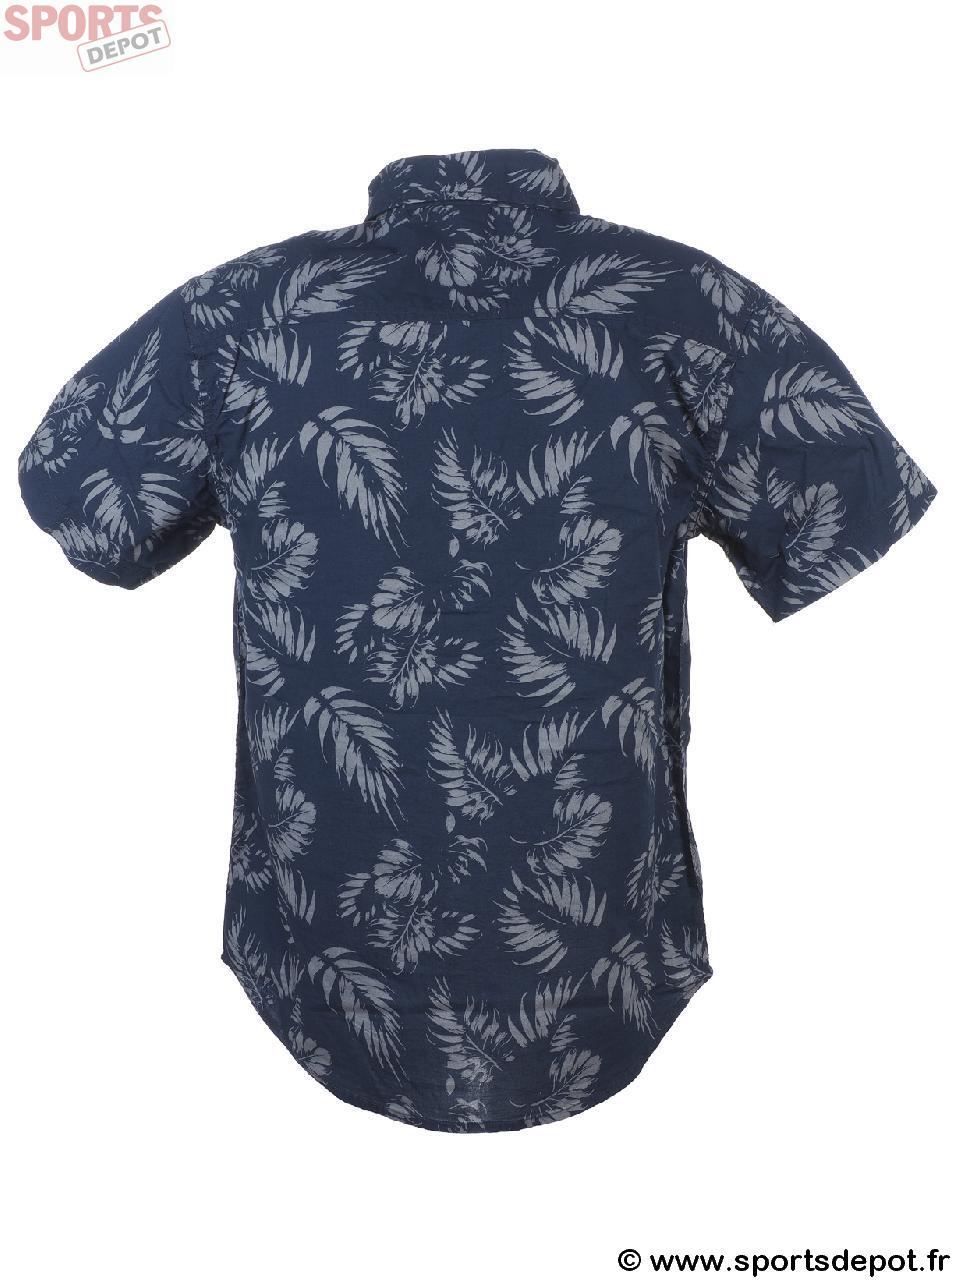 Mc Shirt Tropicool Courtes Manches Navy Longboard Chemise Acheter OzwqZPvSv